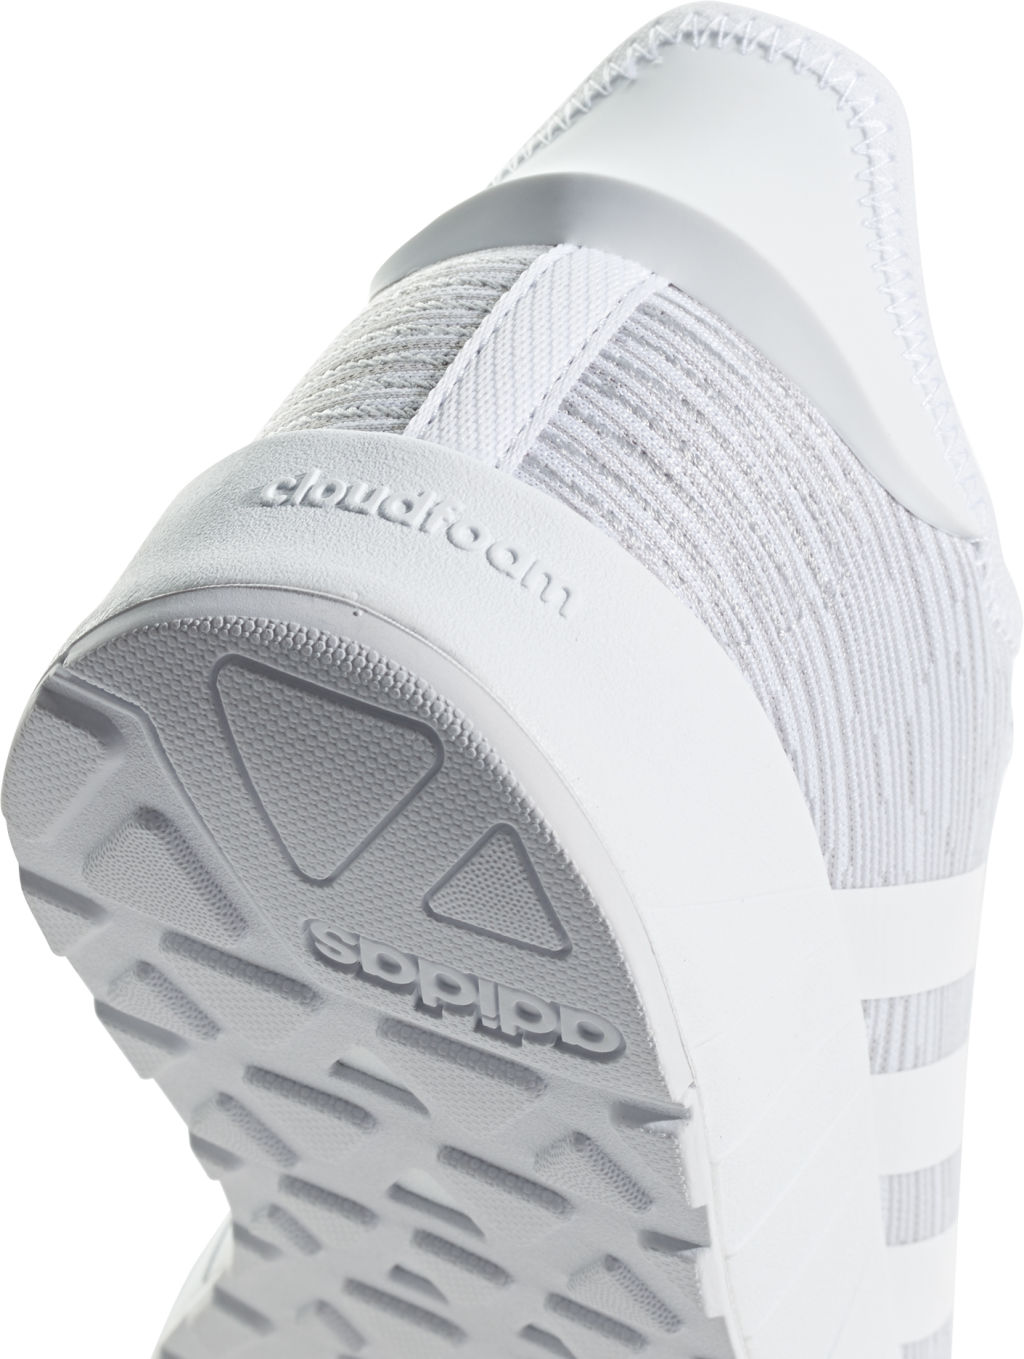 Adidas Questar X BYD naisten tennarit Valkoinen a6b5b0fdd6